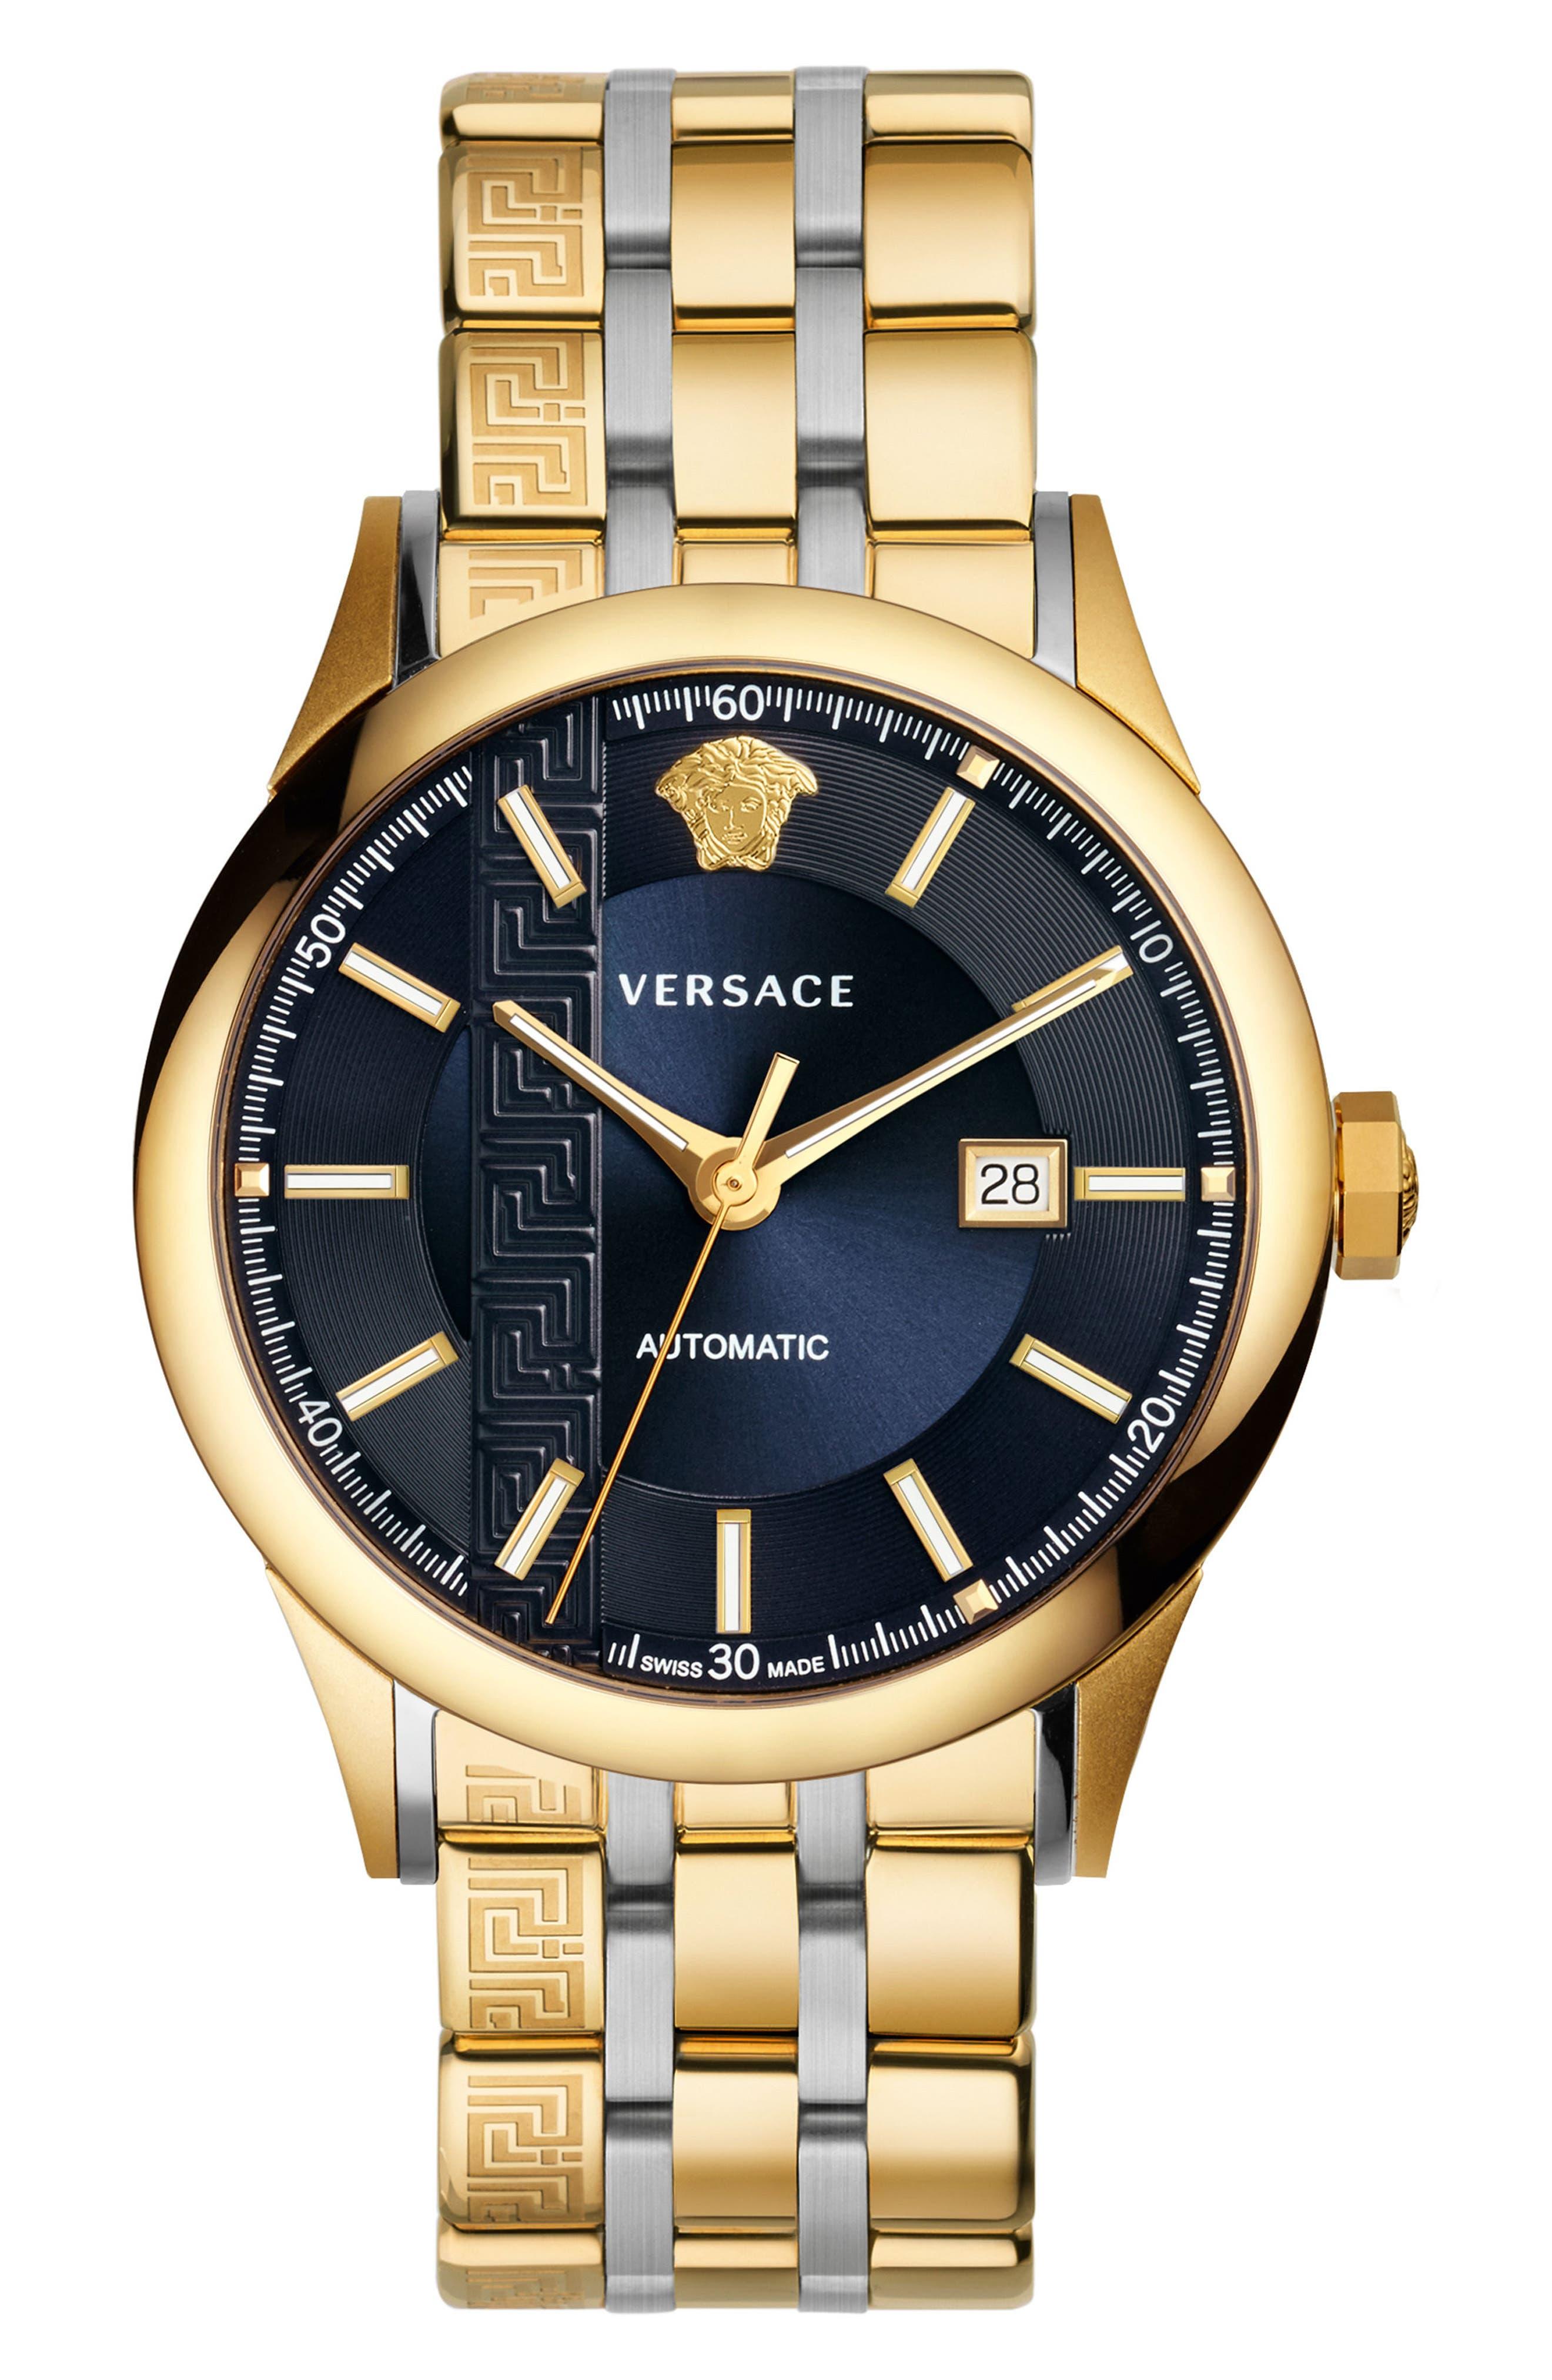 Main Image - Versace Aiakos Automatic Bracelet Watch, 44mm